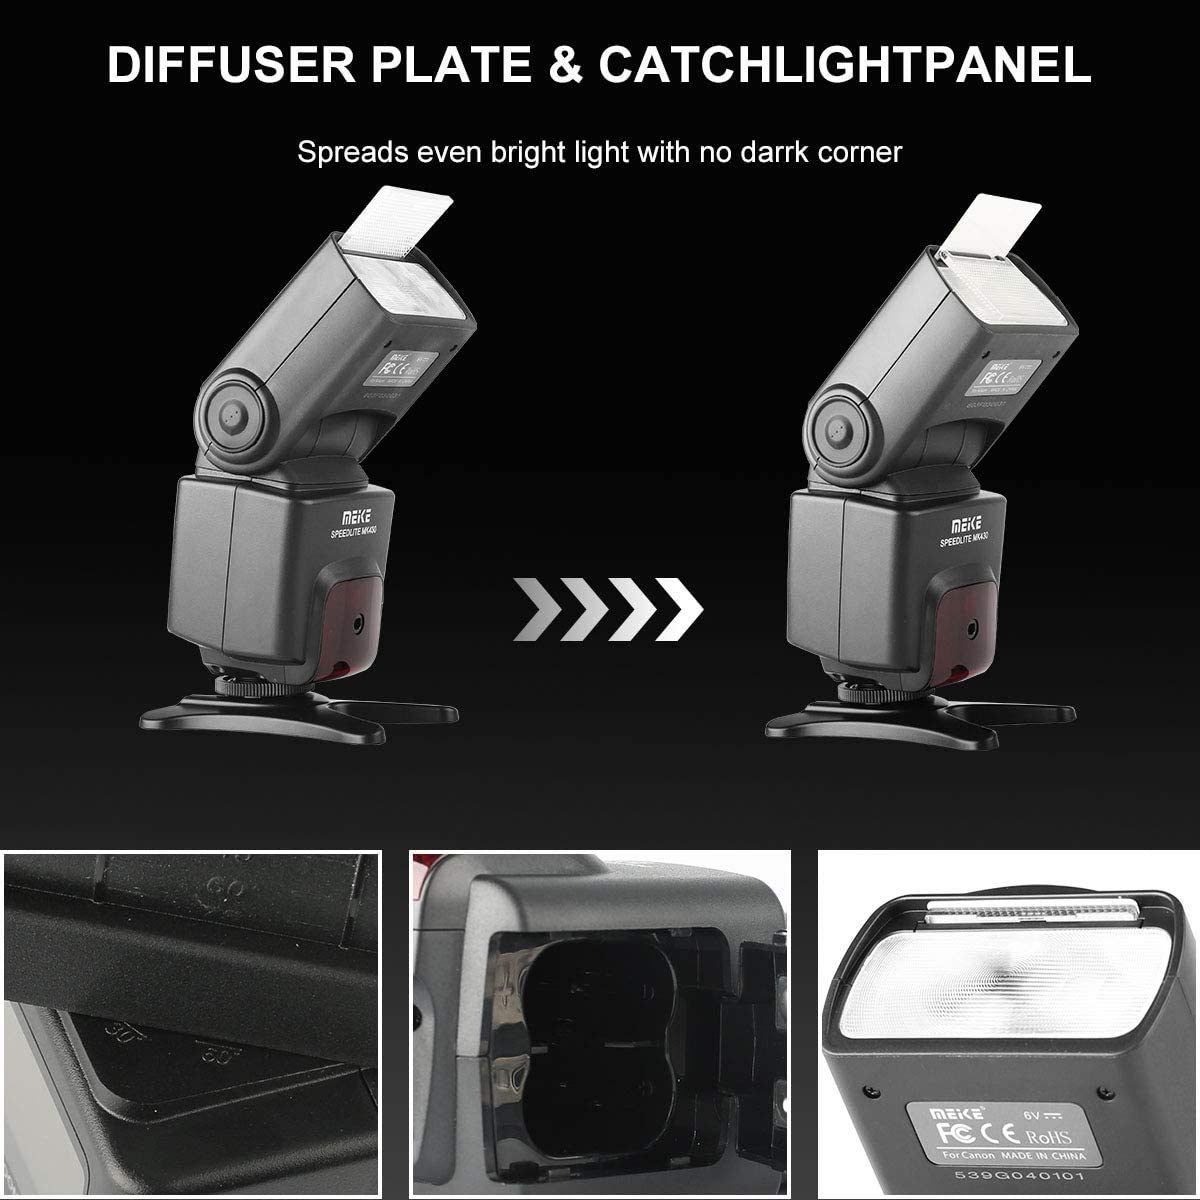 Meike MK430 E-TTL LCD Display Speedlite Shoe Mount Flash for Canon EOS 70D 77D 80D Rebel T7i T6i T6s T6 T5i T5 T4i T3i SL2 and Other Eos Digital DSLR Camera with Standard Hot Shoe Stand